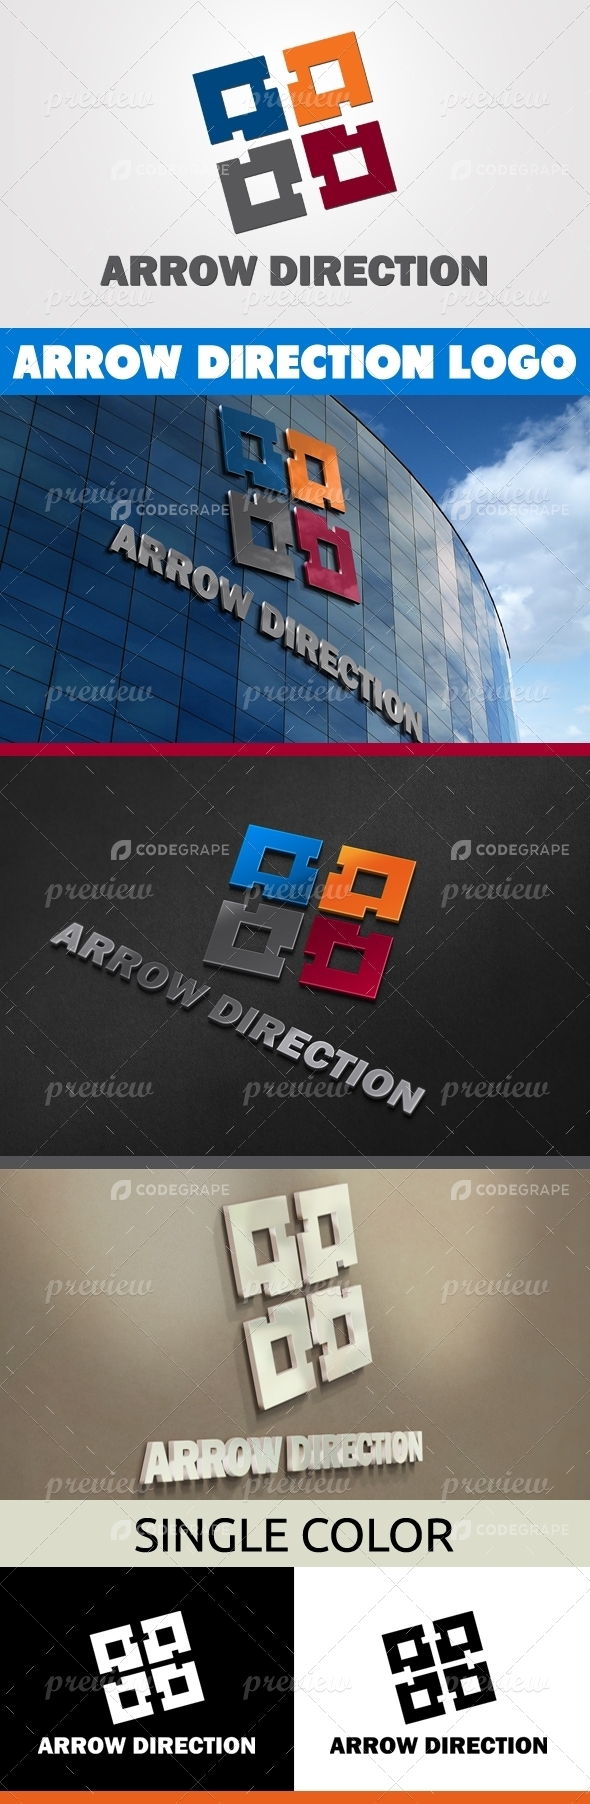 Arrow Direction Logo